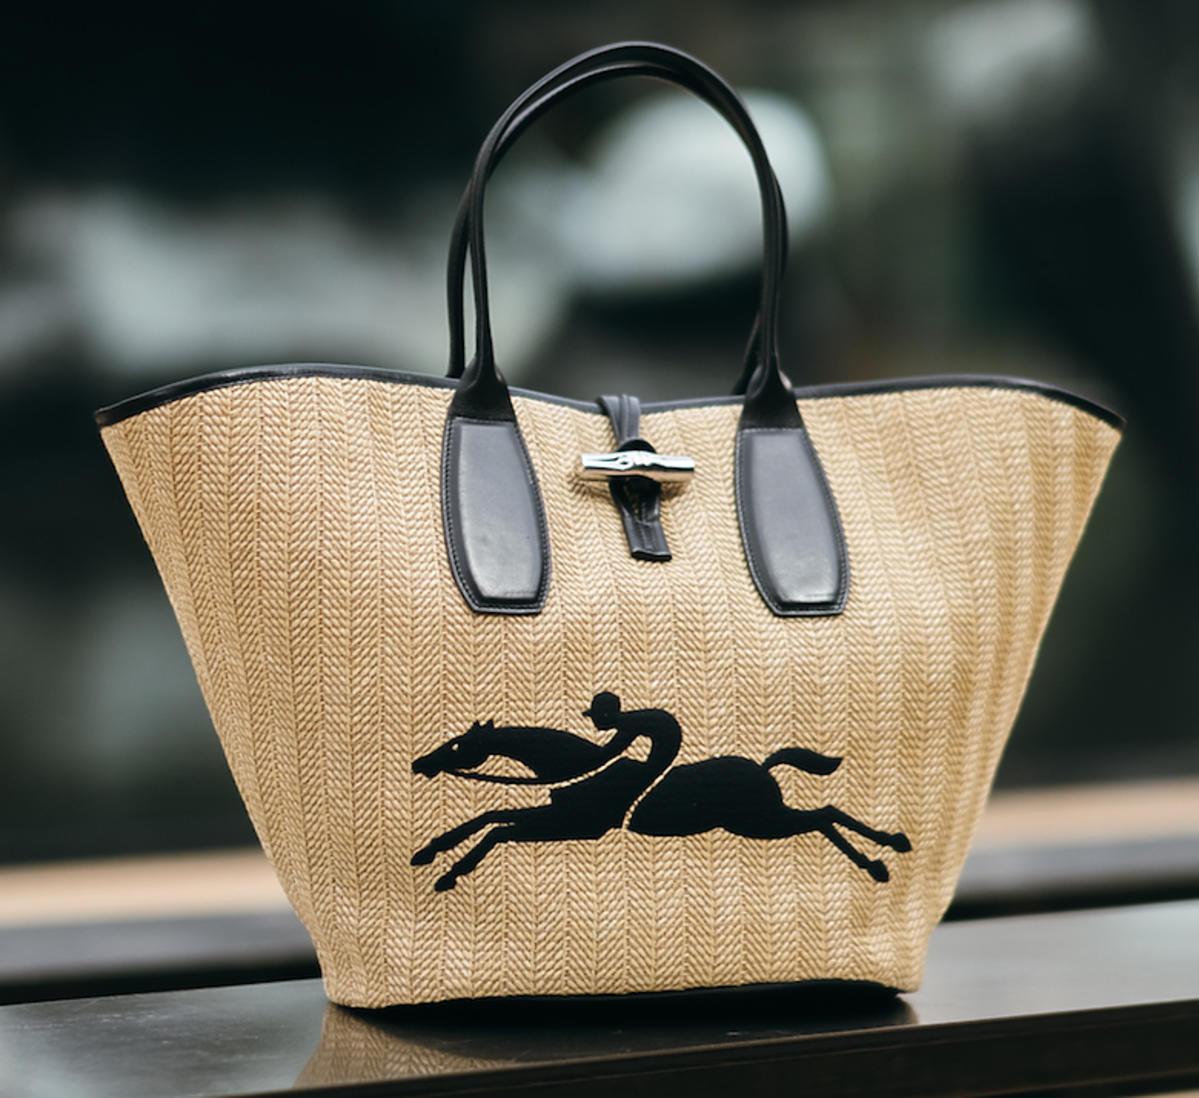 Torebki Longchamp skradną wasze serce!